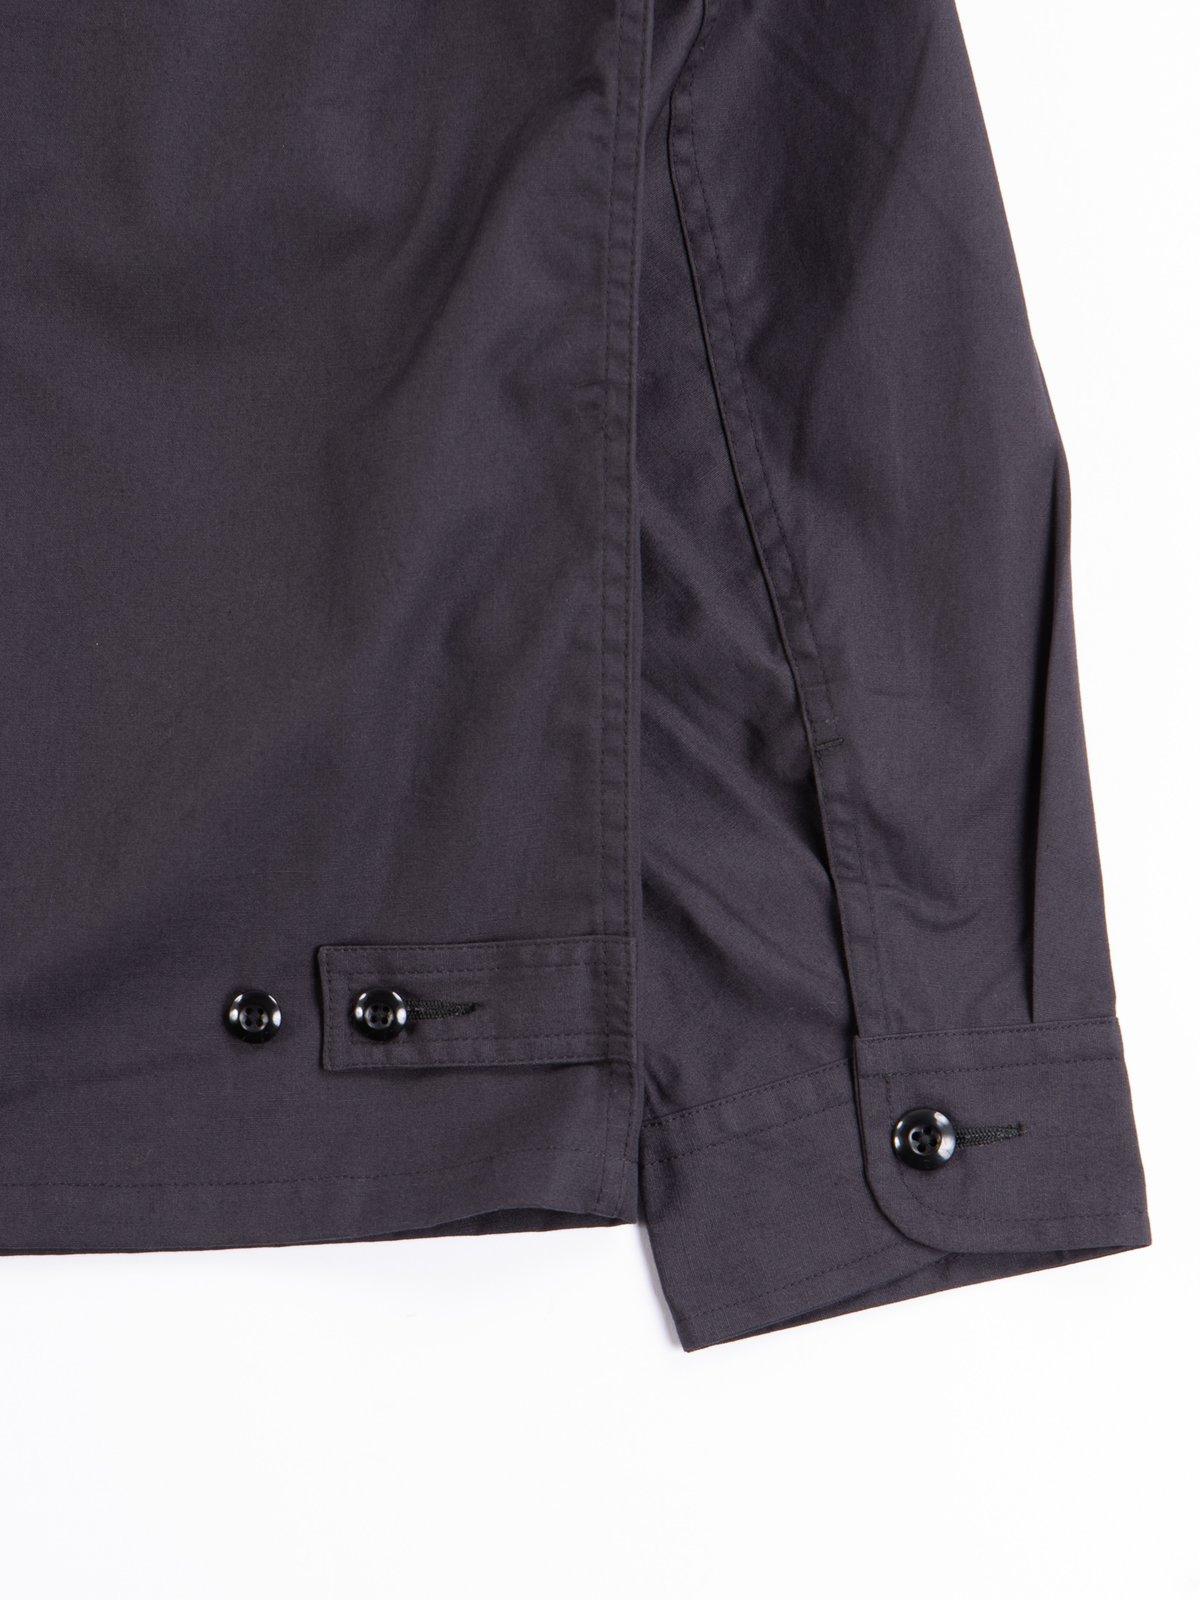 Fade Black Selvedge Poplin Cotton Combat Short Jacket - Image 6